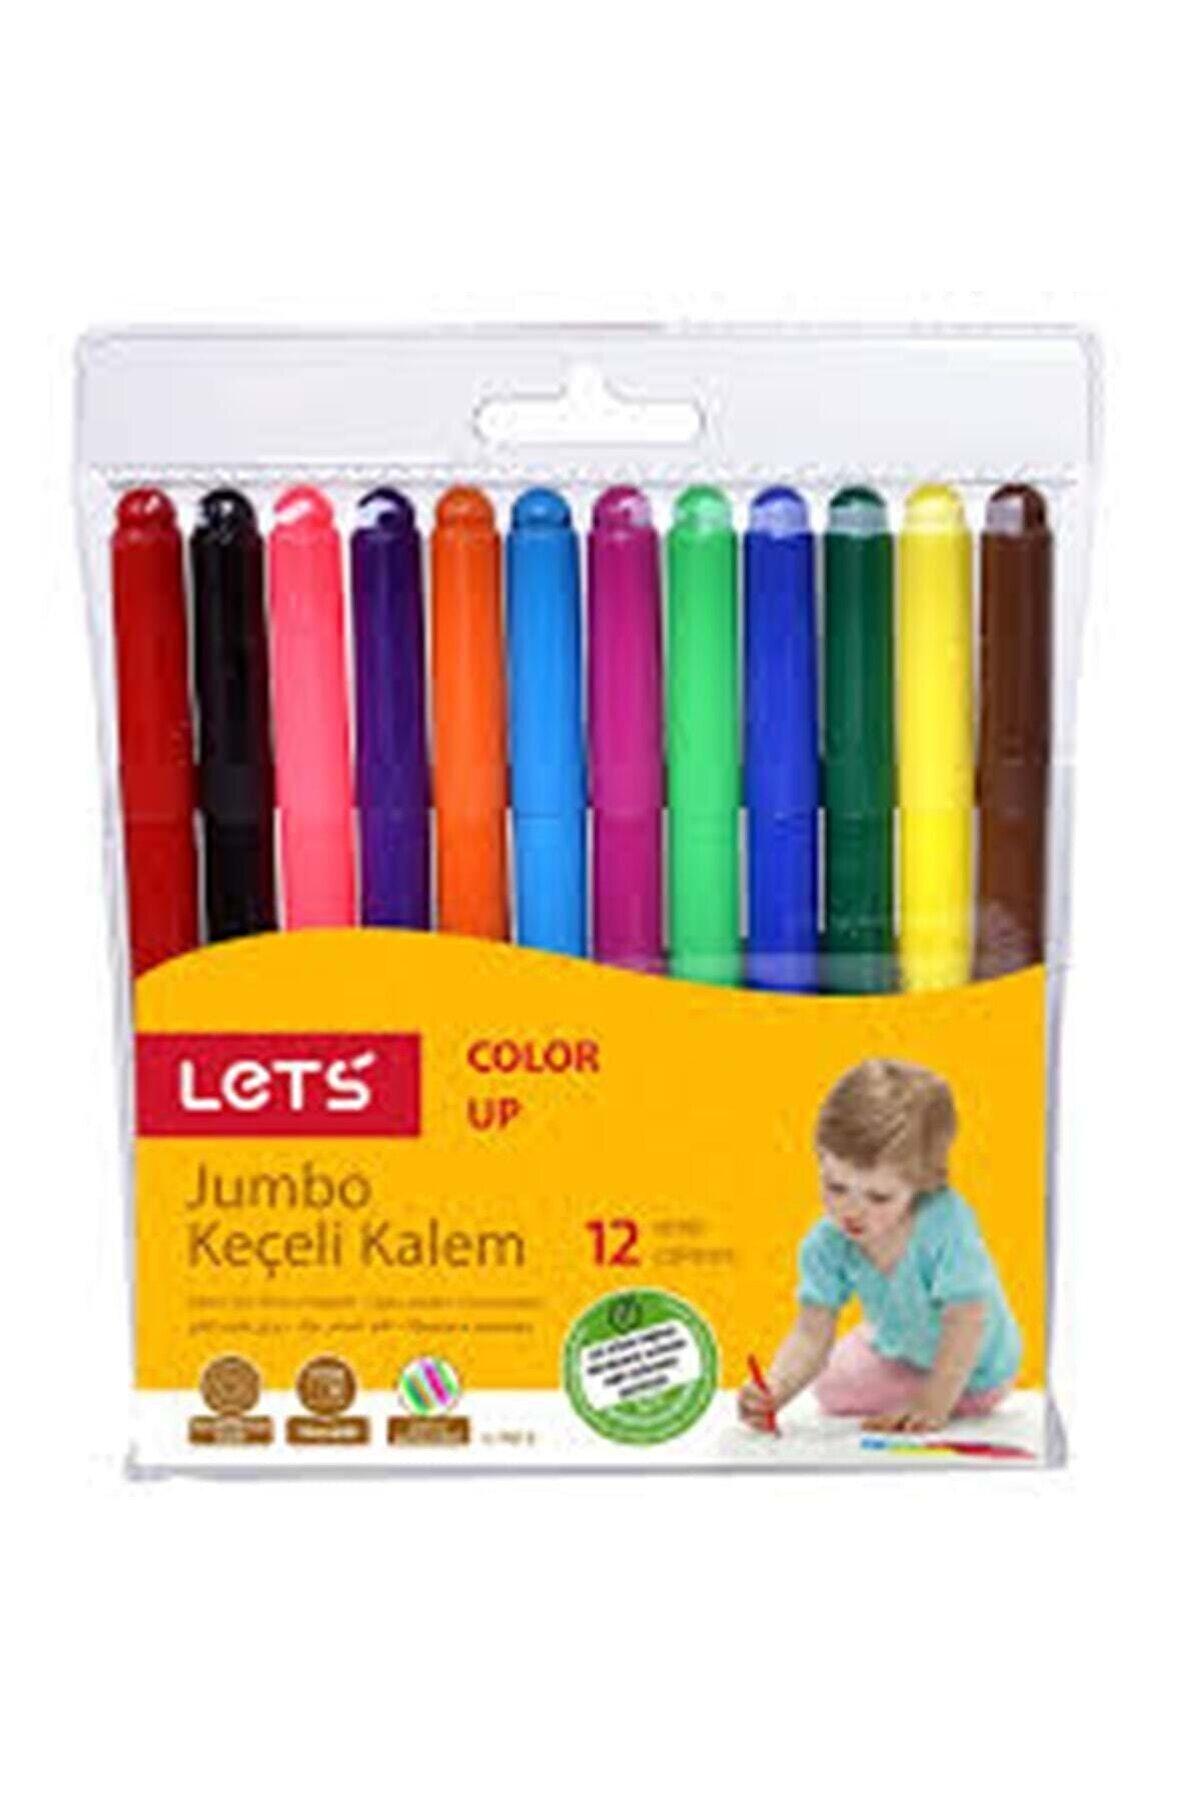 Lets Jumbo Keçeli Kalem L-7012 12 Renk